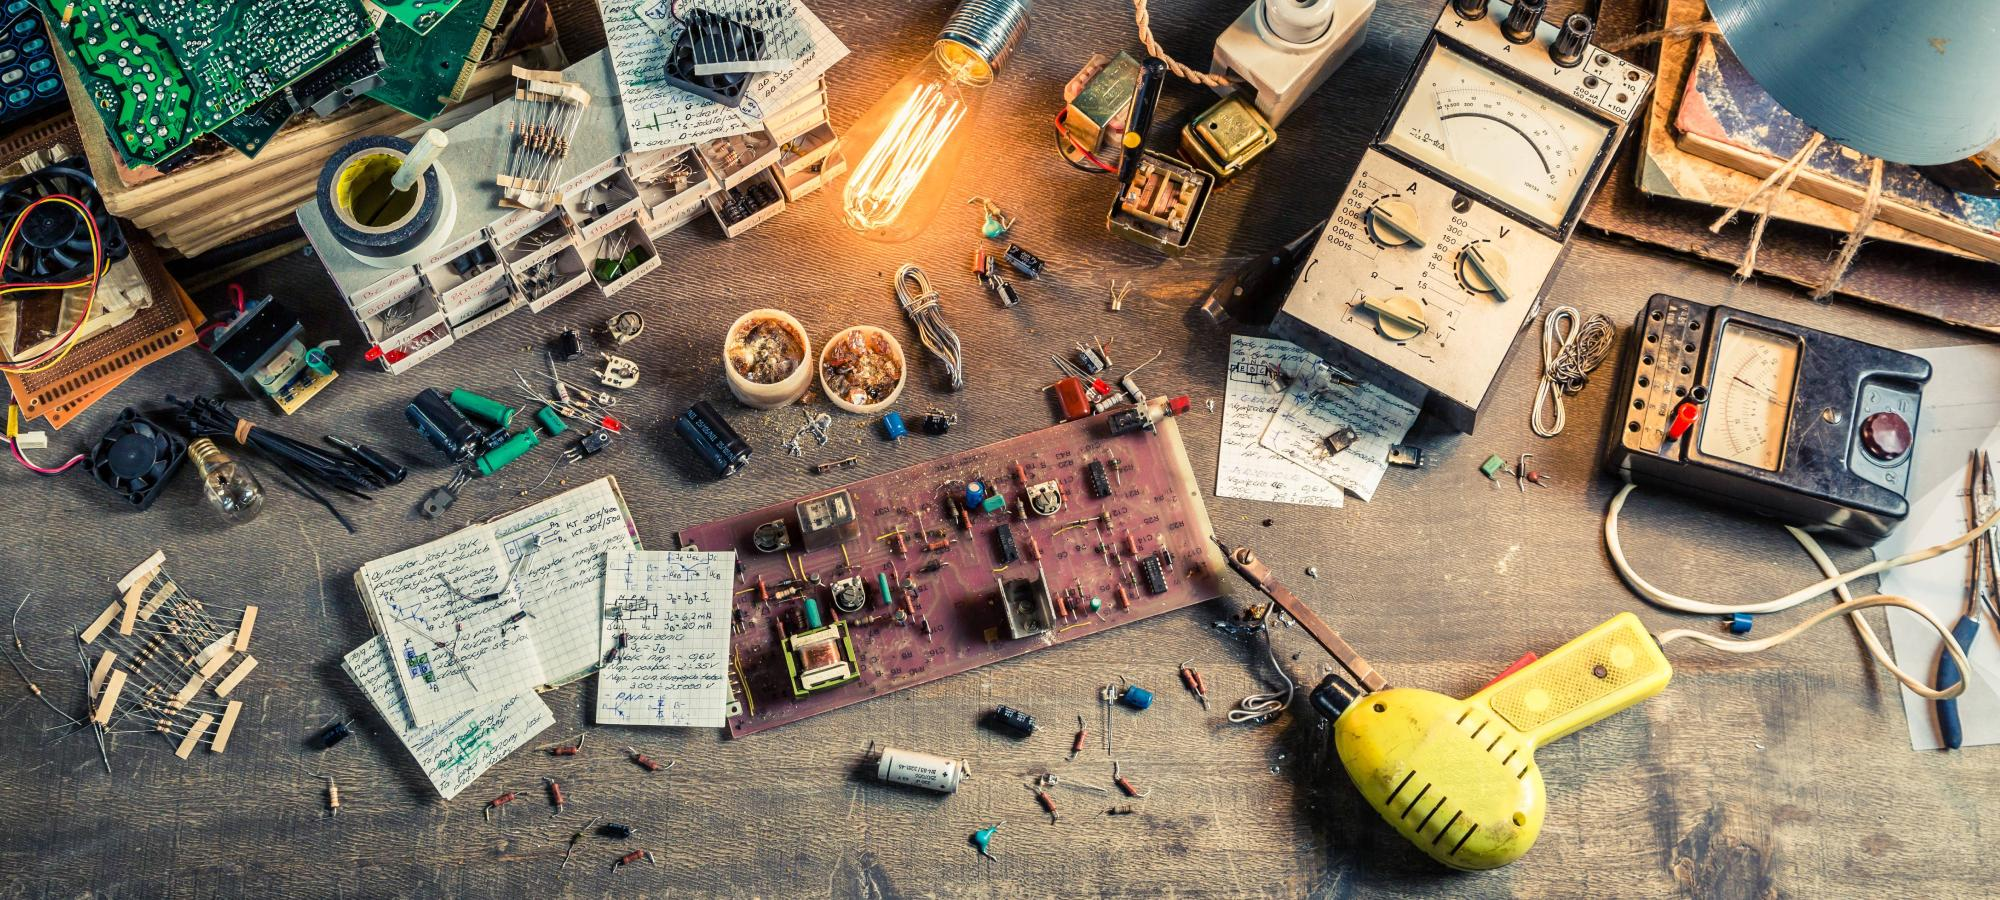 Maker - IoT - Creativi digitali